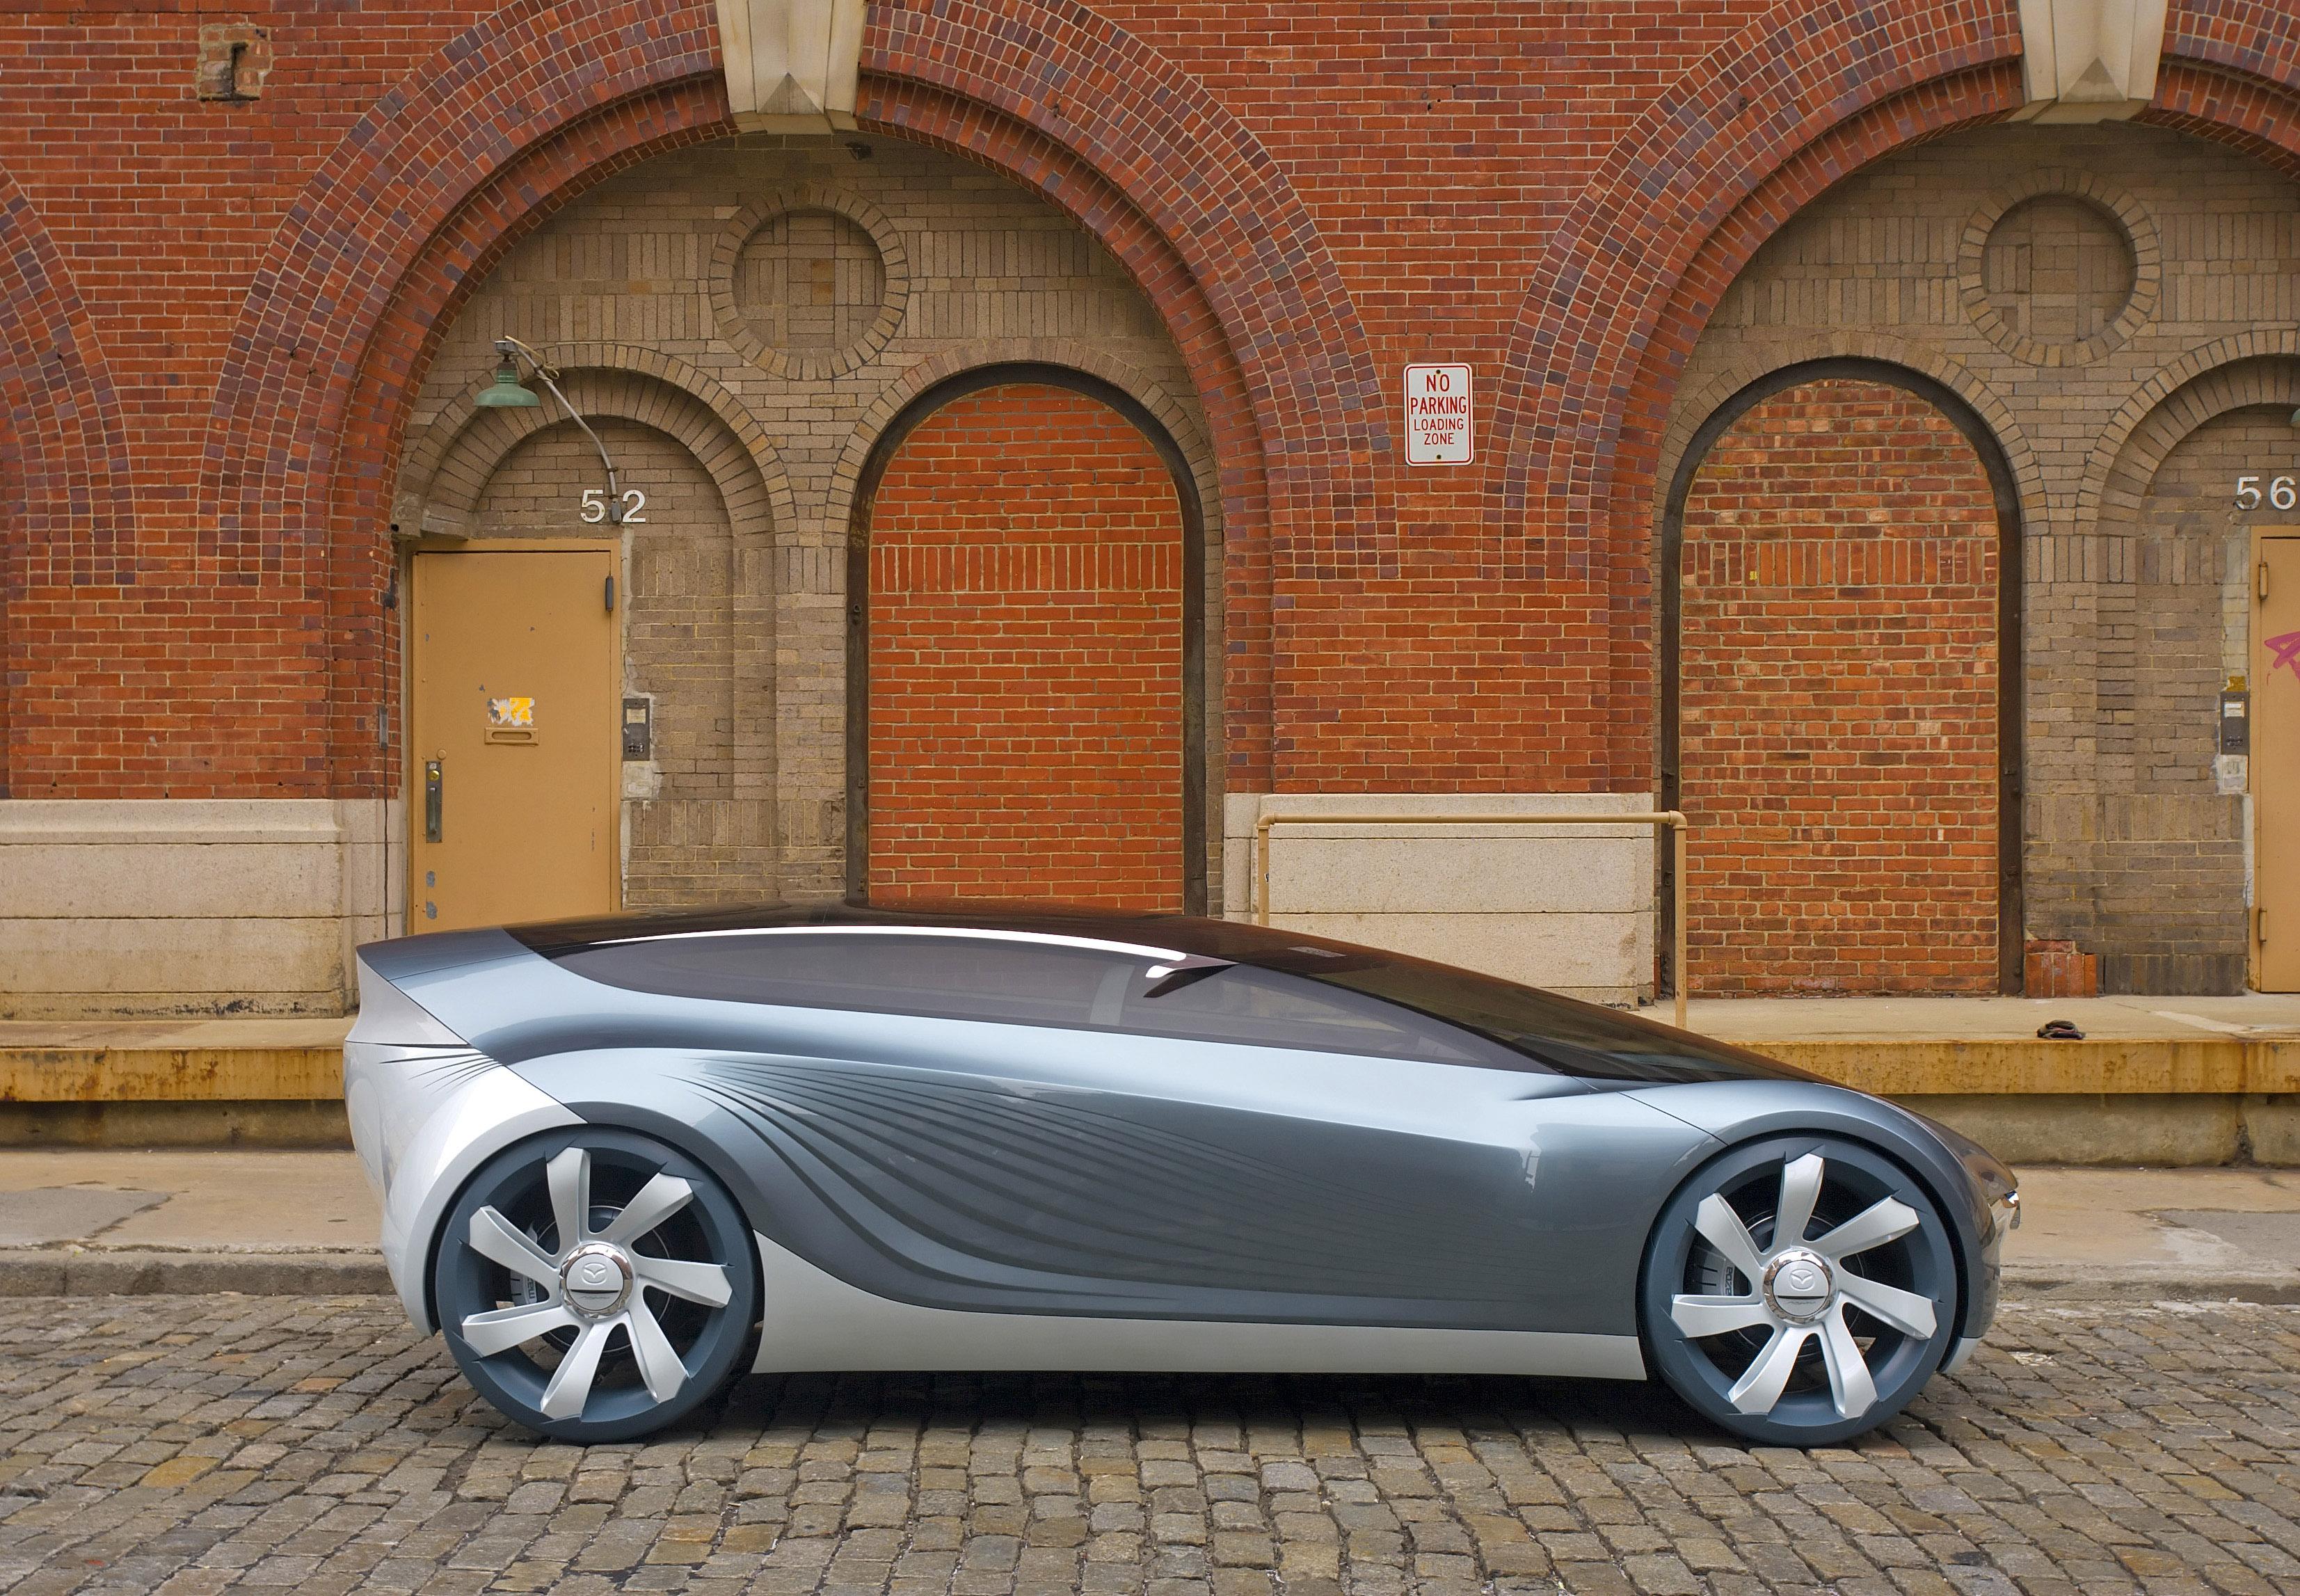 https://www.automobilesreview.com/gallery/mazda-nagare-concept/mazda-nagare-concept-03.jpg